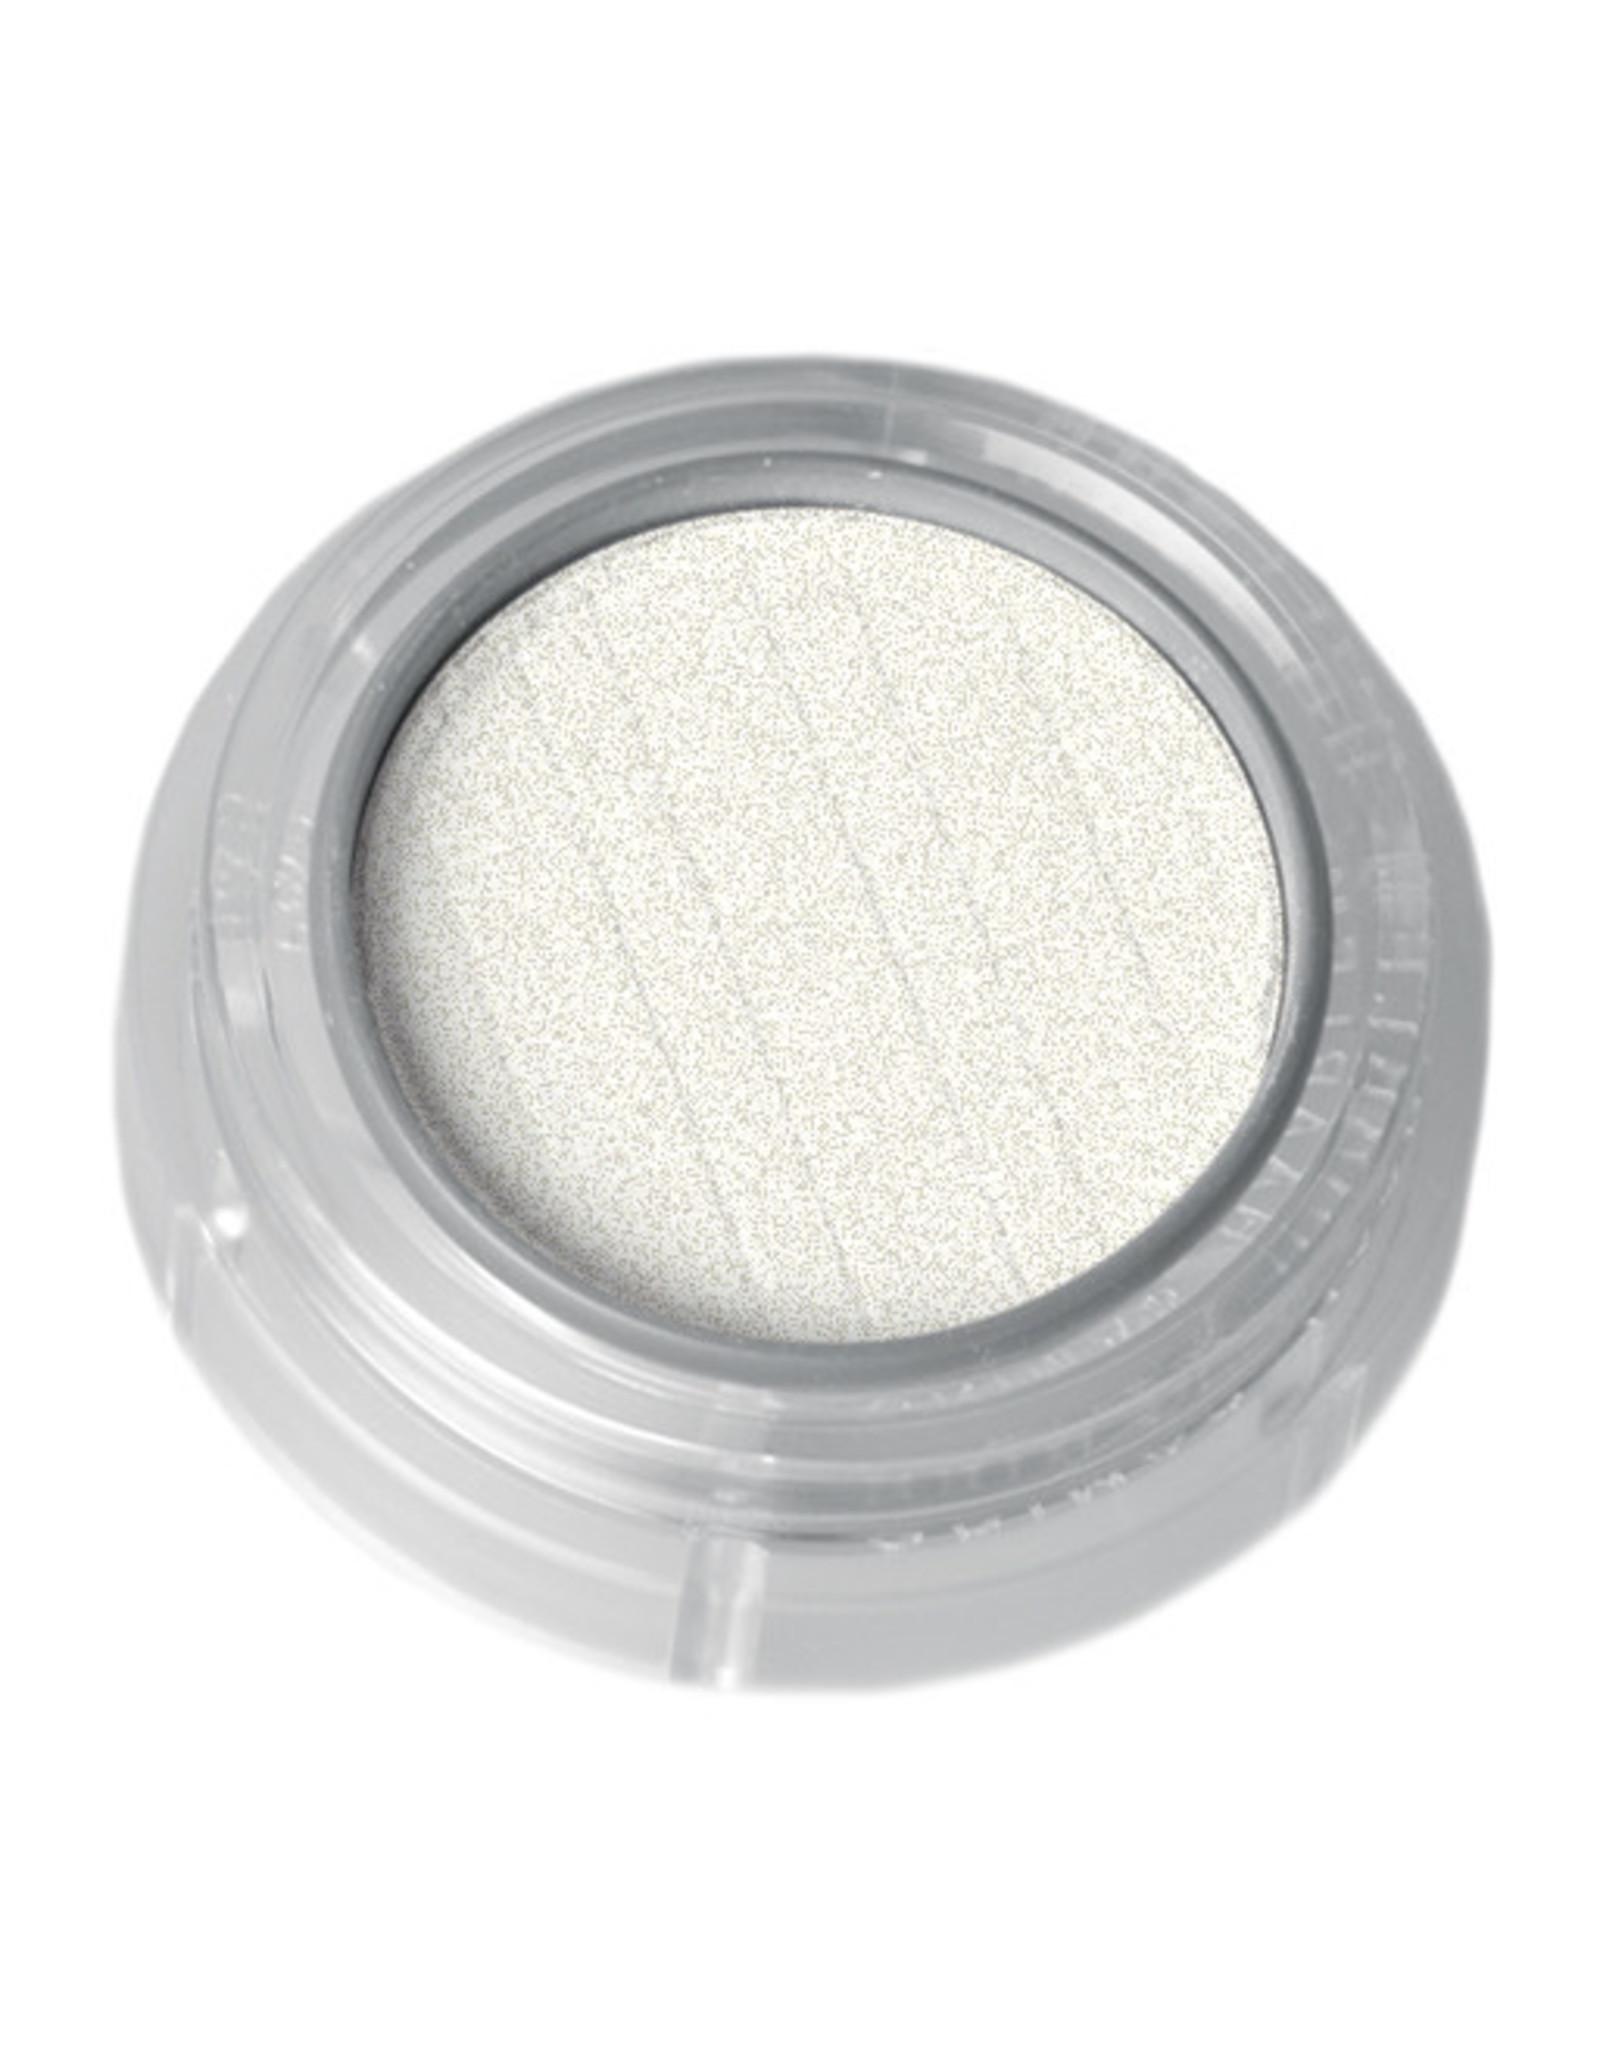 Grimas EYESHADOW/ROUGE PEARL 704 Pearl Zilver A1 (2,5 g)